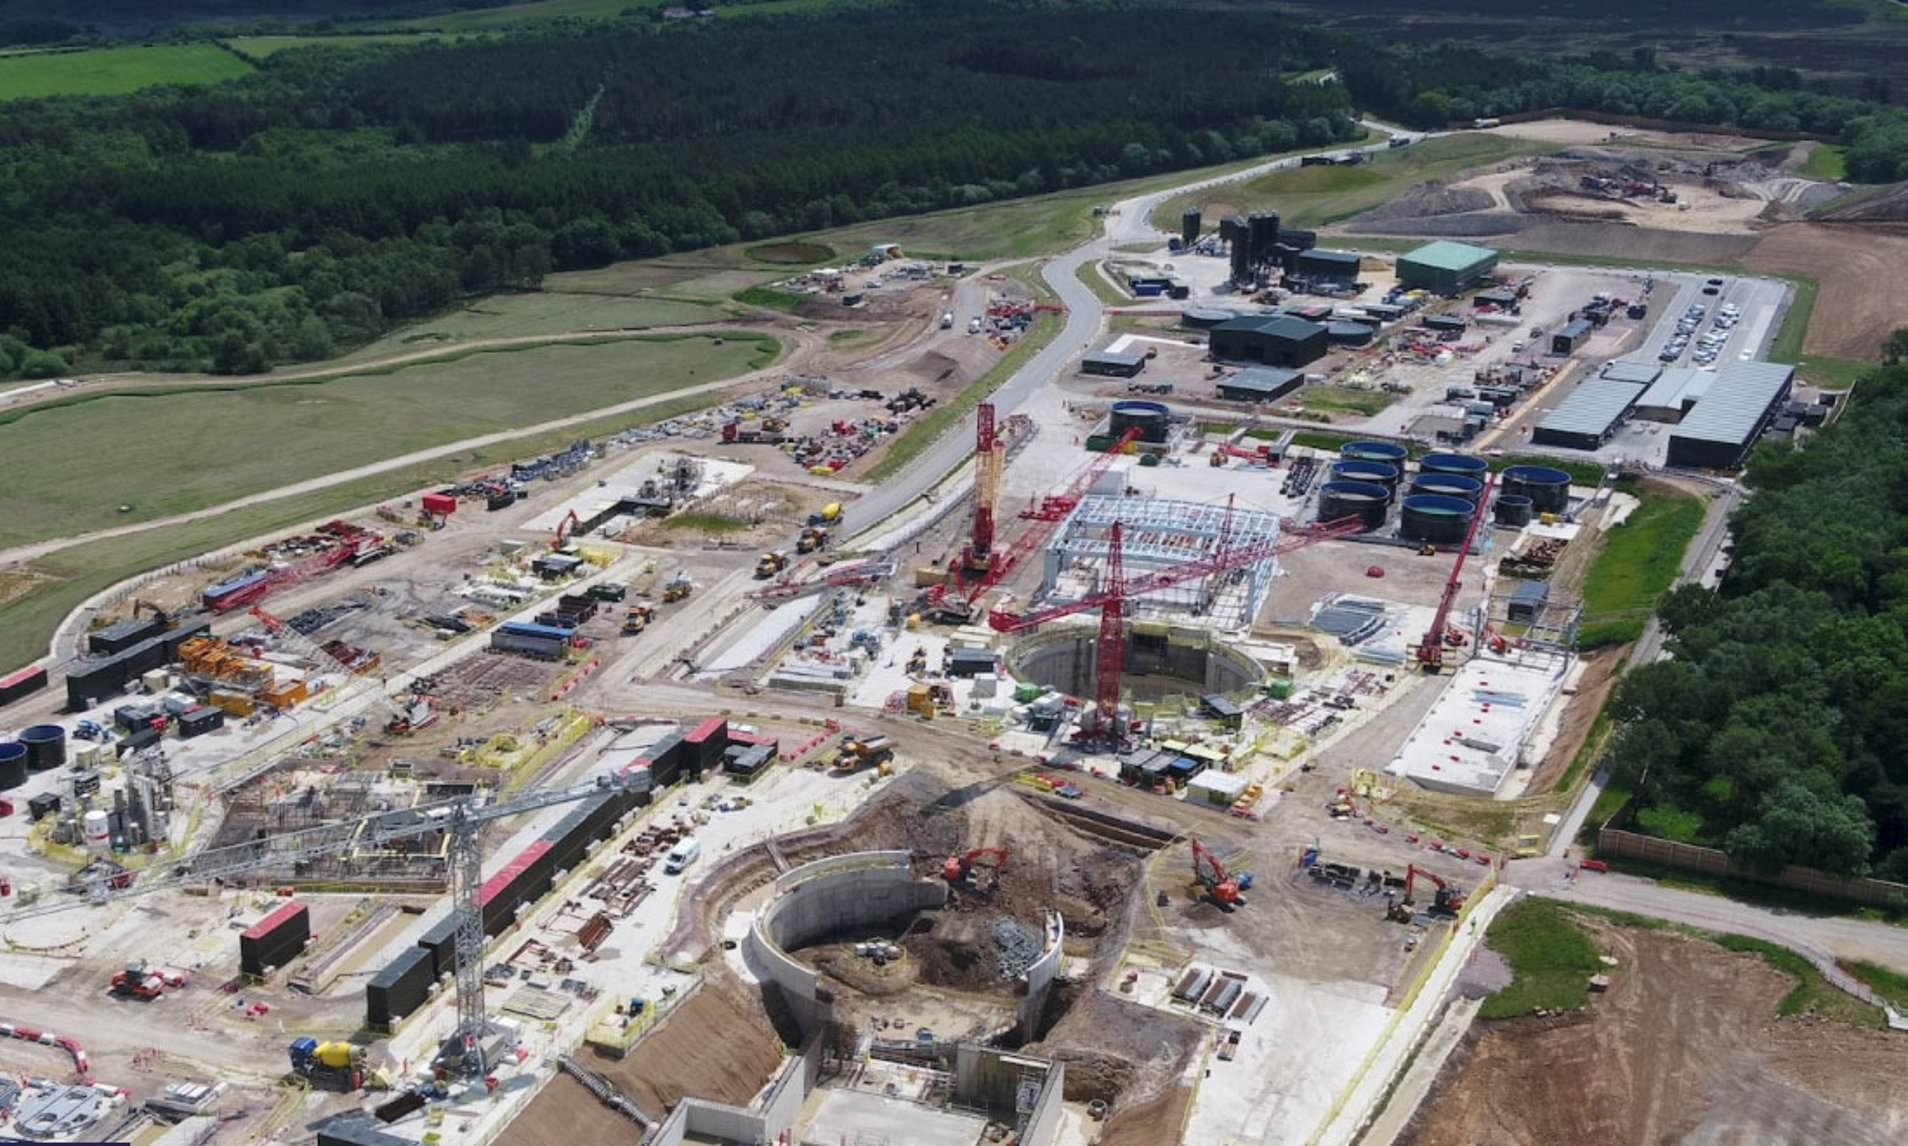 UK's Biggest Fertilizer Mining Project in Doubt as Sirius Scraps Bond Sale